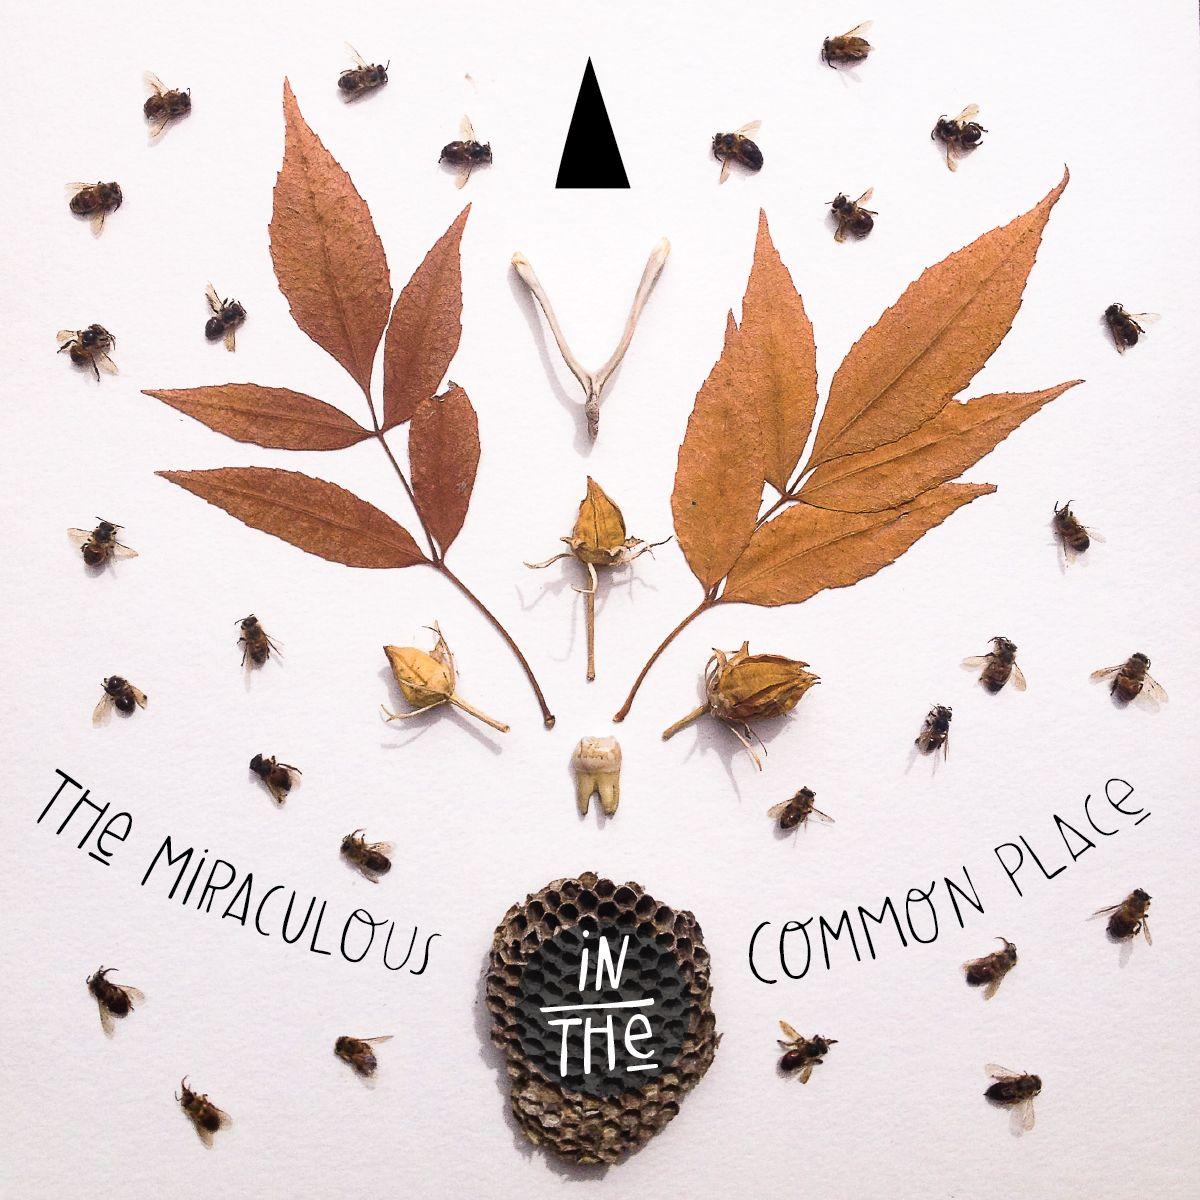 Common-Almanac